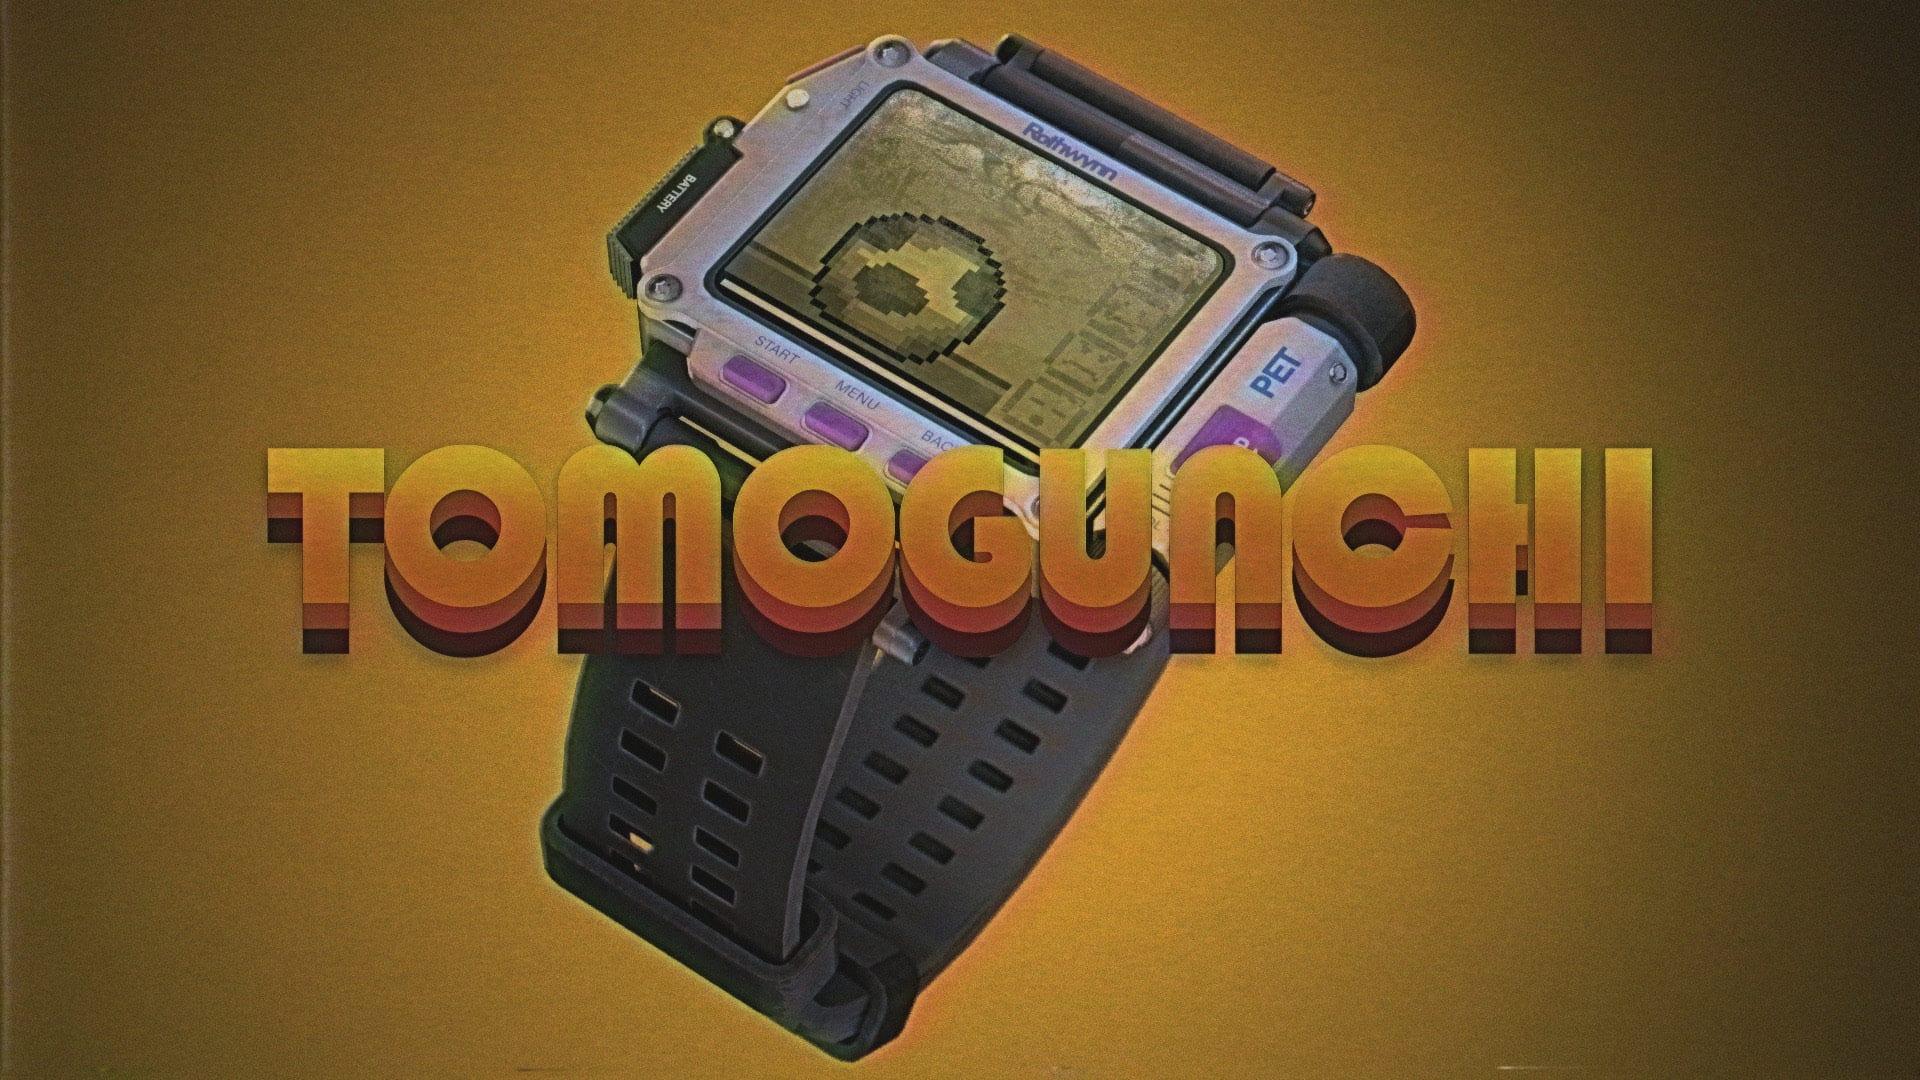 Introducing Tomogunchi: Now Live In Call of Duty: Modern Warfare